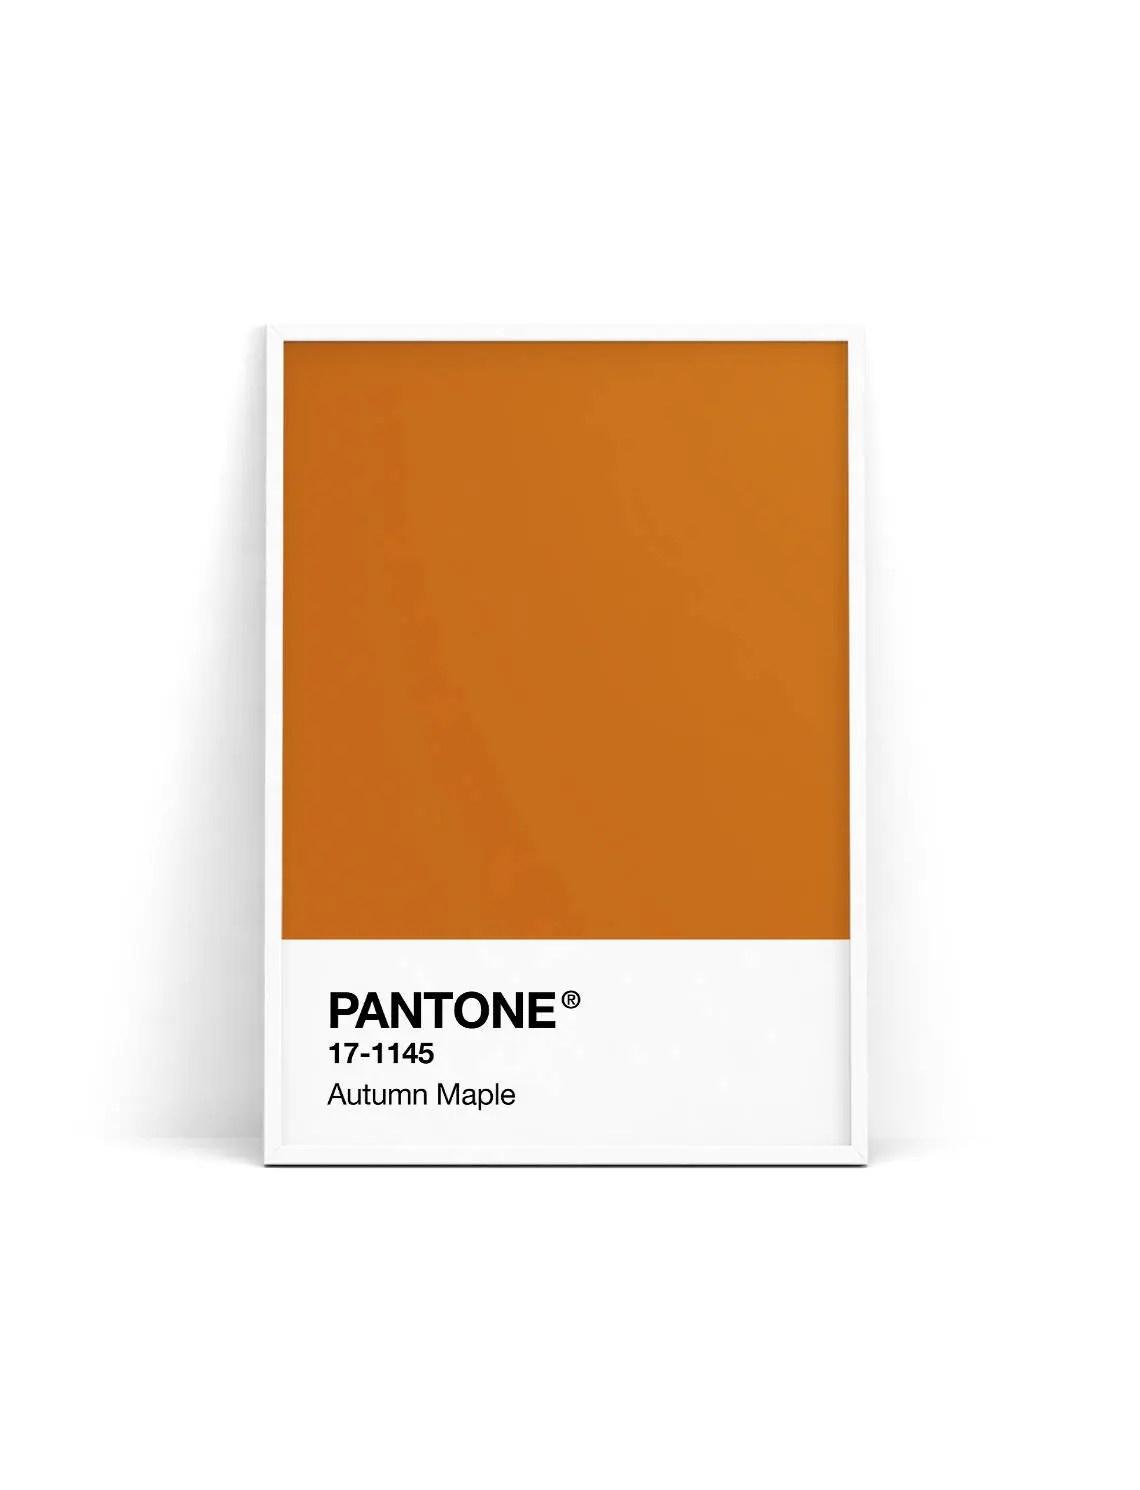 pantone print pantone poster pantone autumn maple pantone fall 2017 pantone orange pantone wall art pantone decor pantone printable